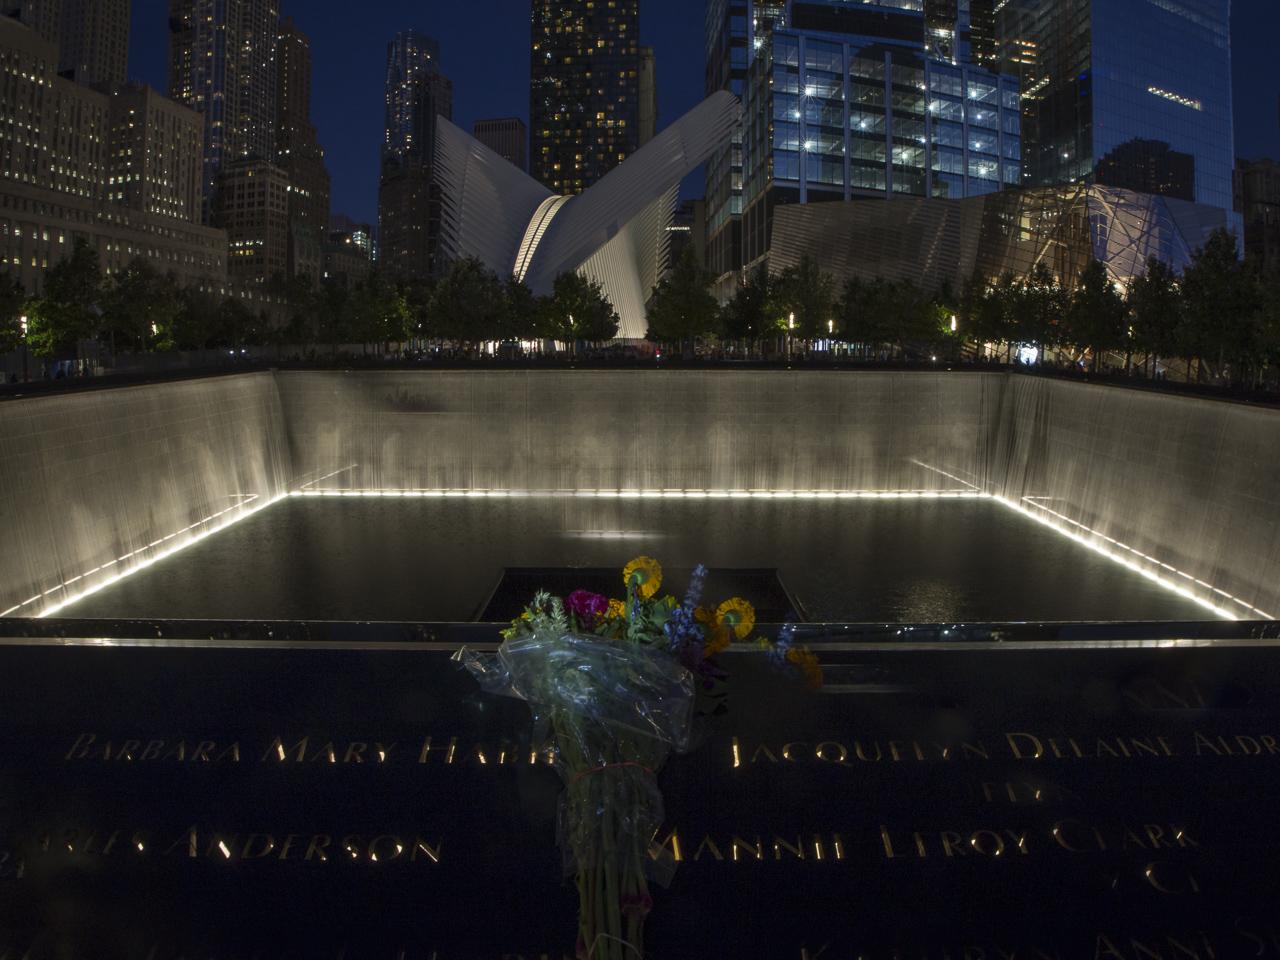 NYC Ground Zero - Digital (Night) - Name Withheld Per Request